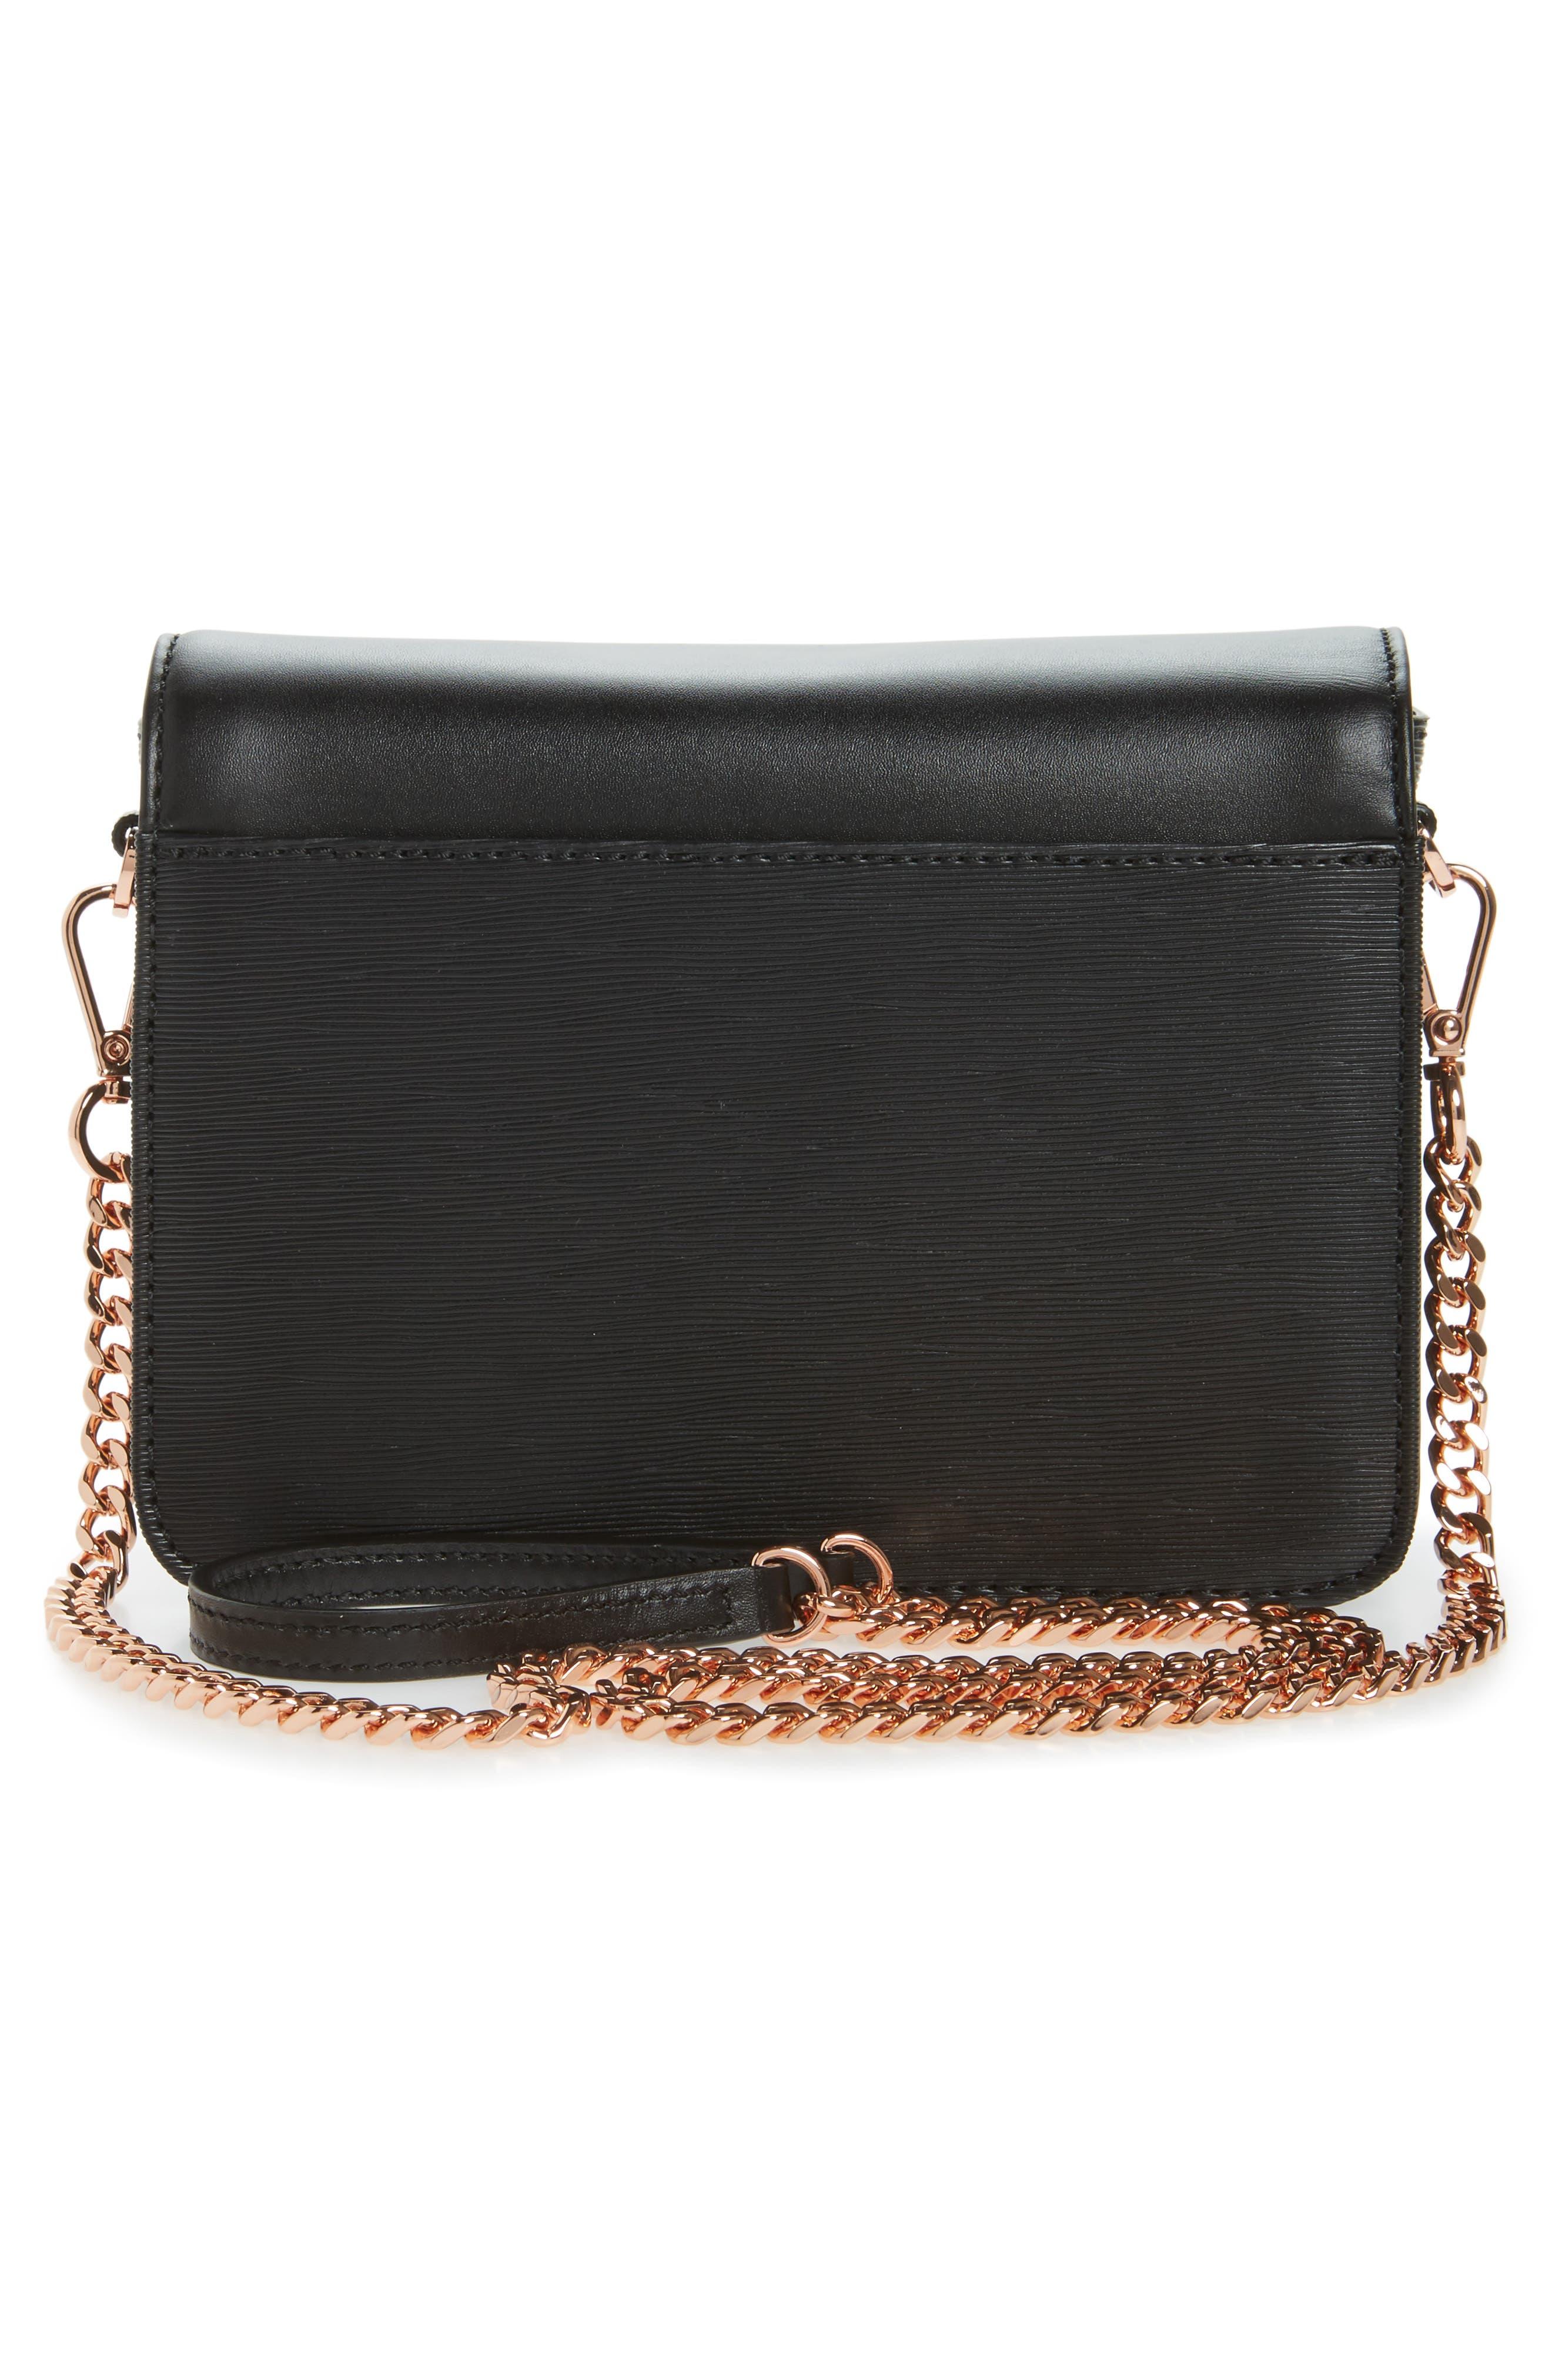 Callih Bow Leather Crossbody Bag,                             Alternate thumbnail 3, color,                             001